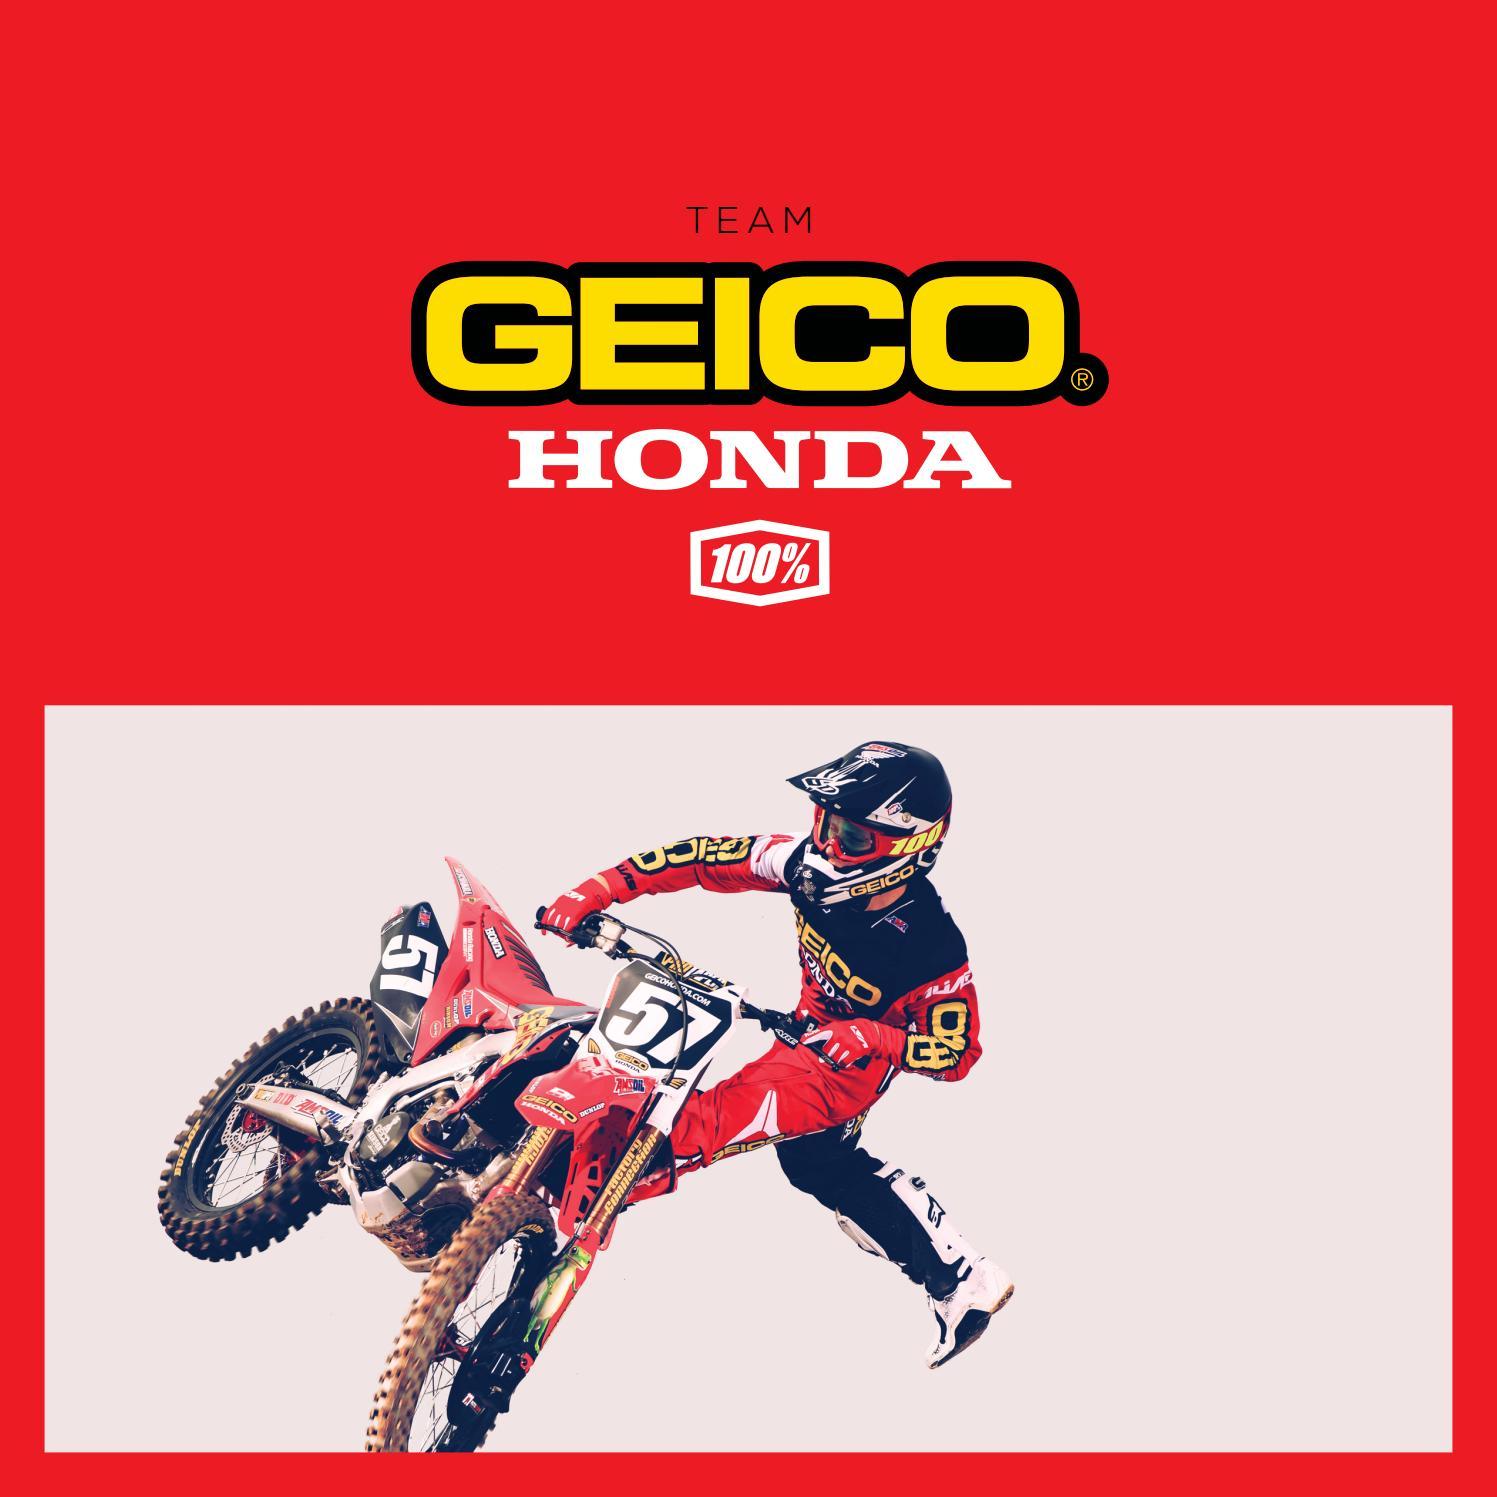 c2ab58444c1 2017 GEICO Honda Team Collection by 100% - issuu